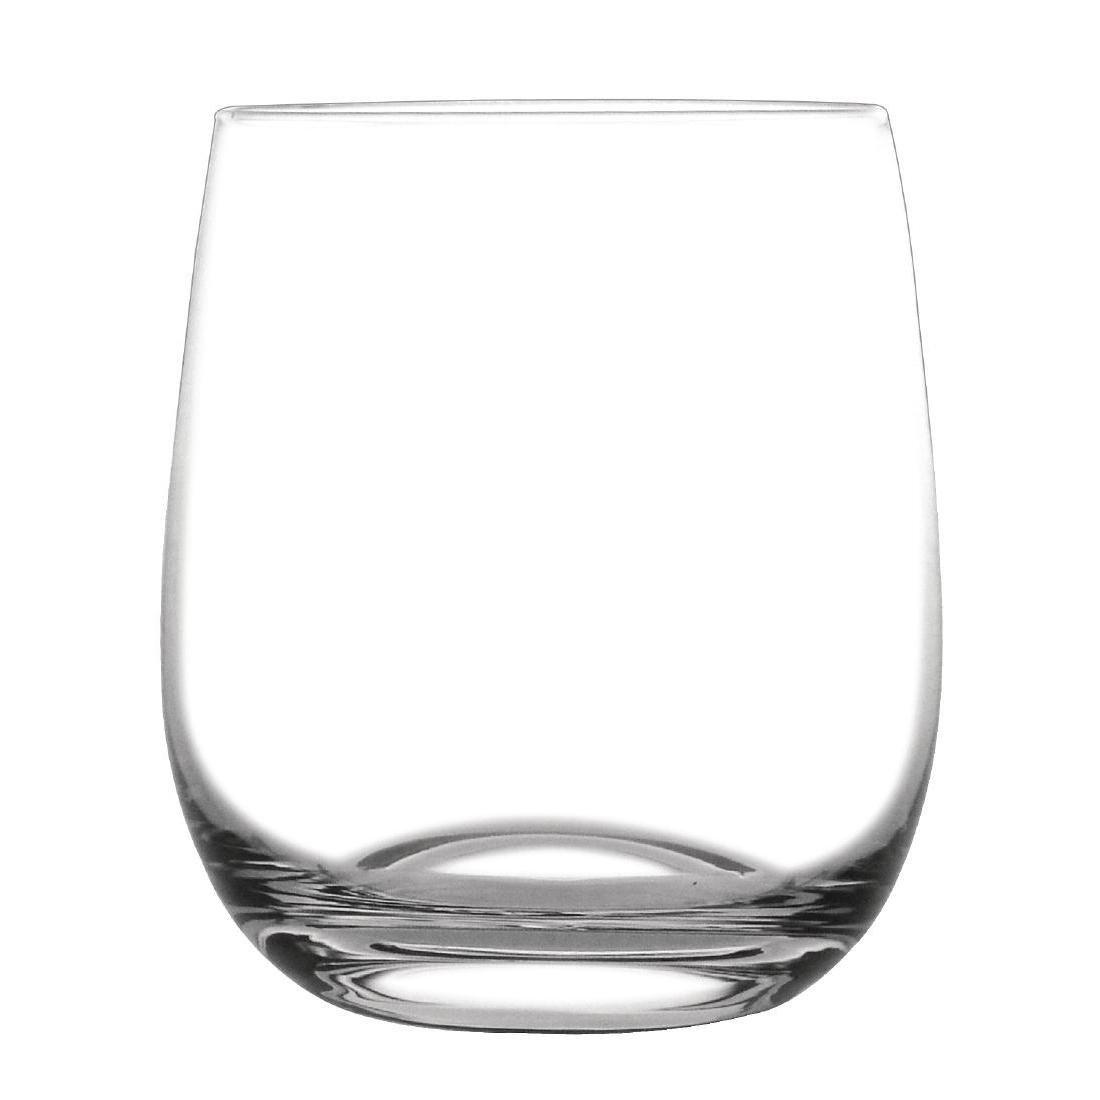 Gobelet arrondi en cristal par 6